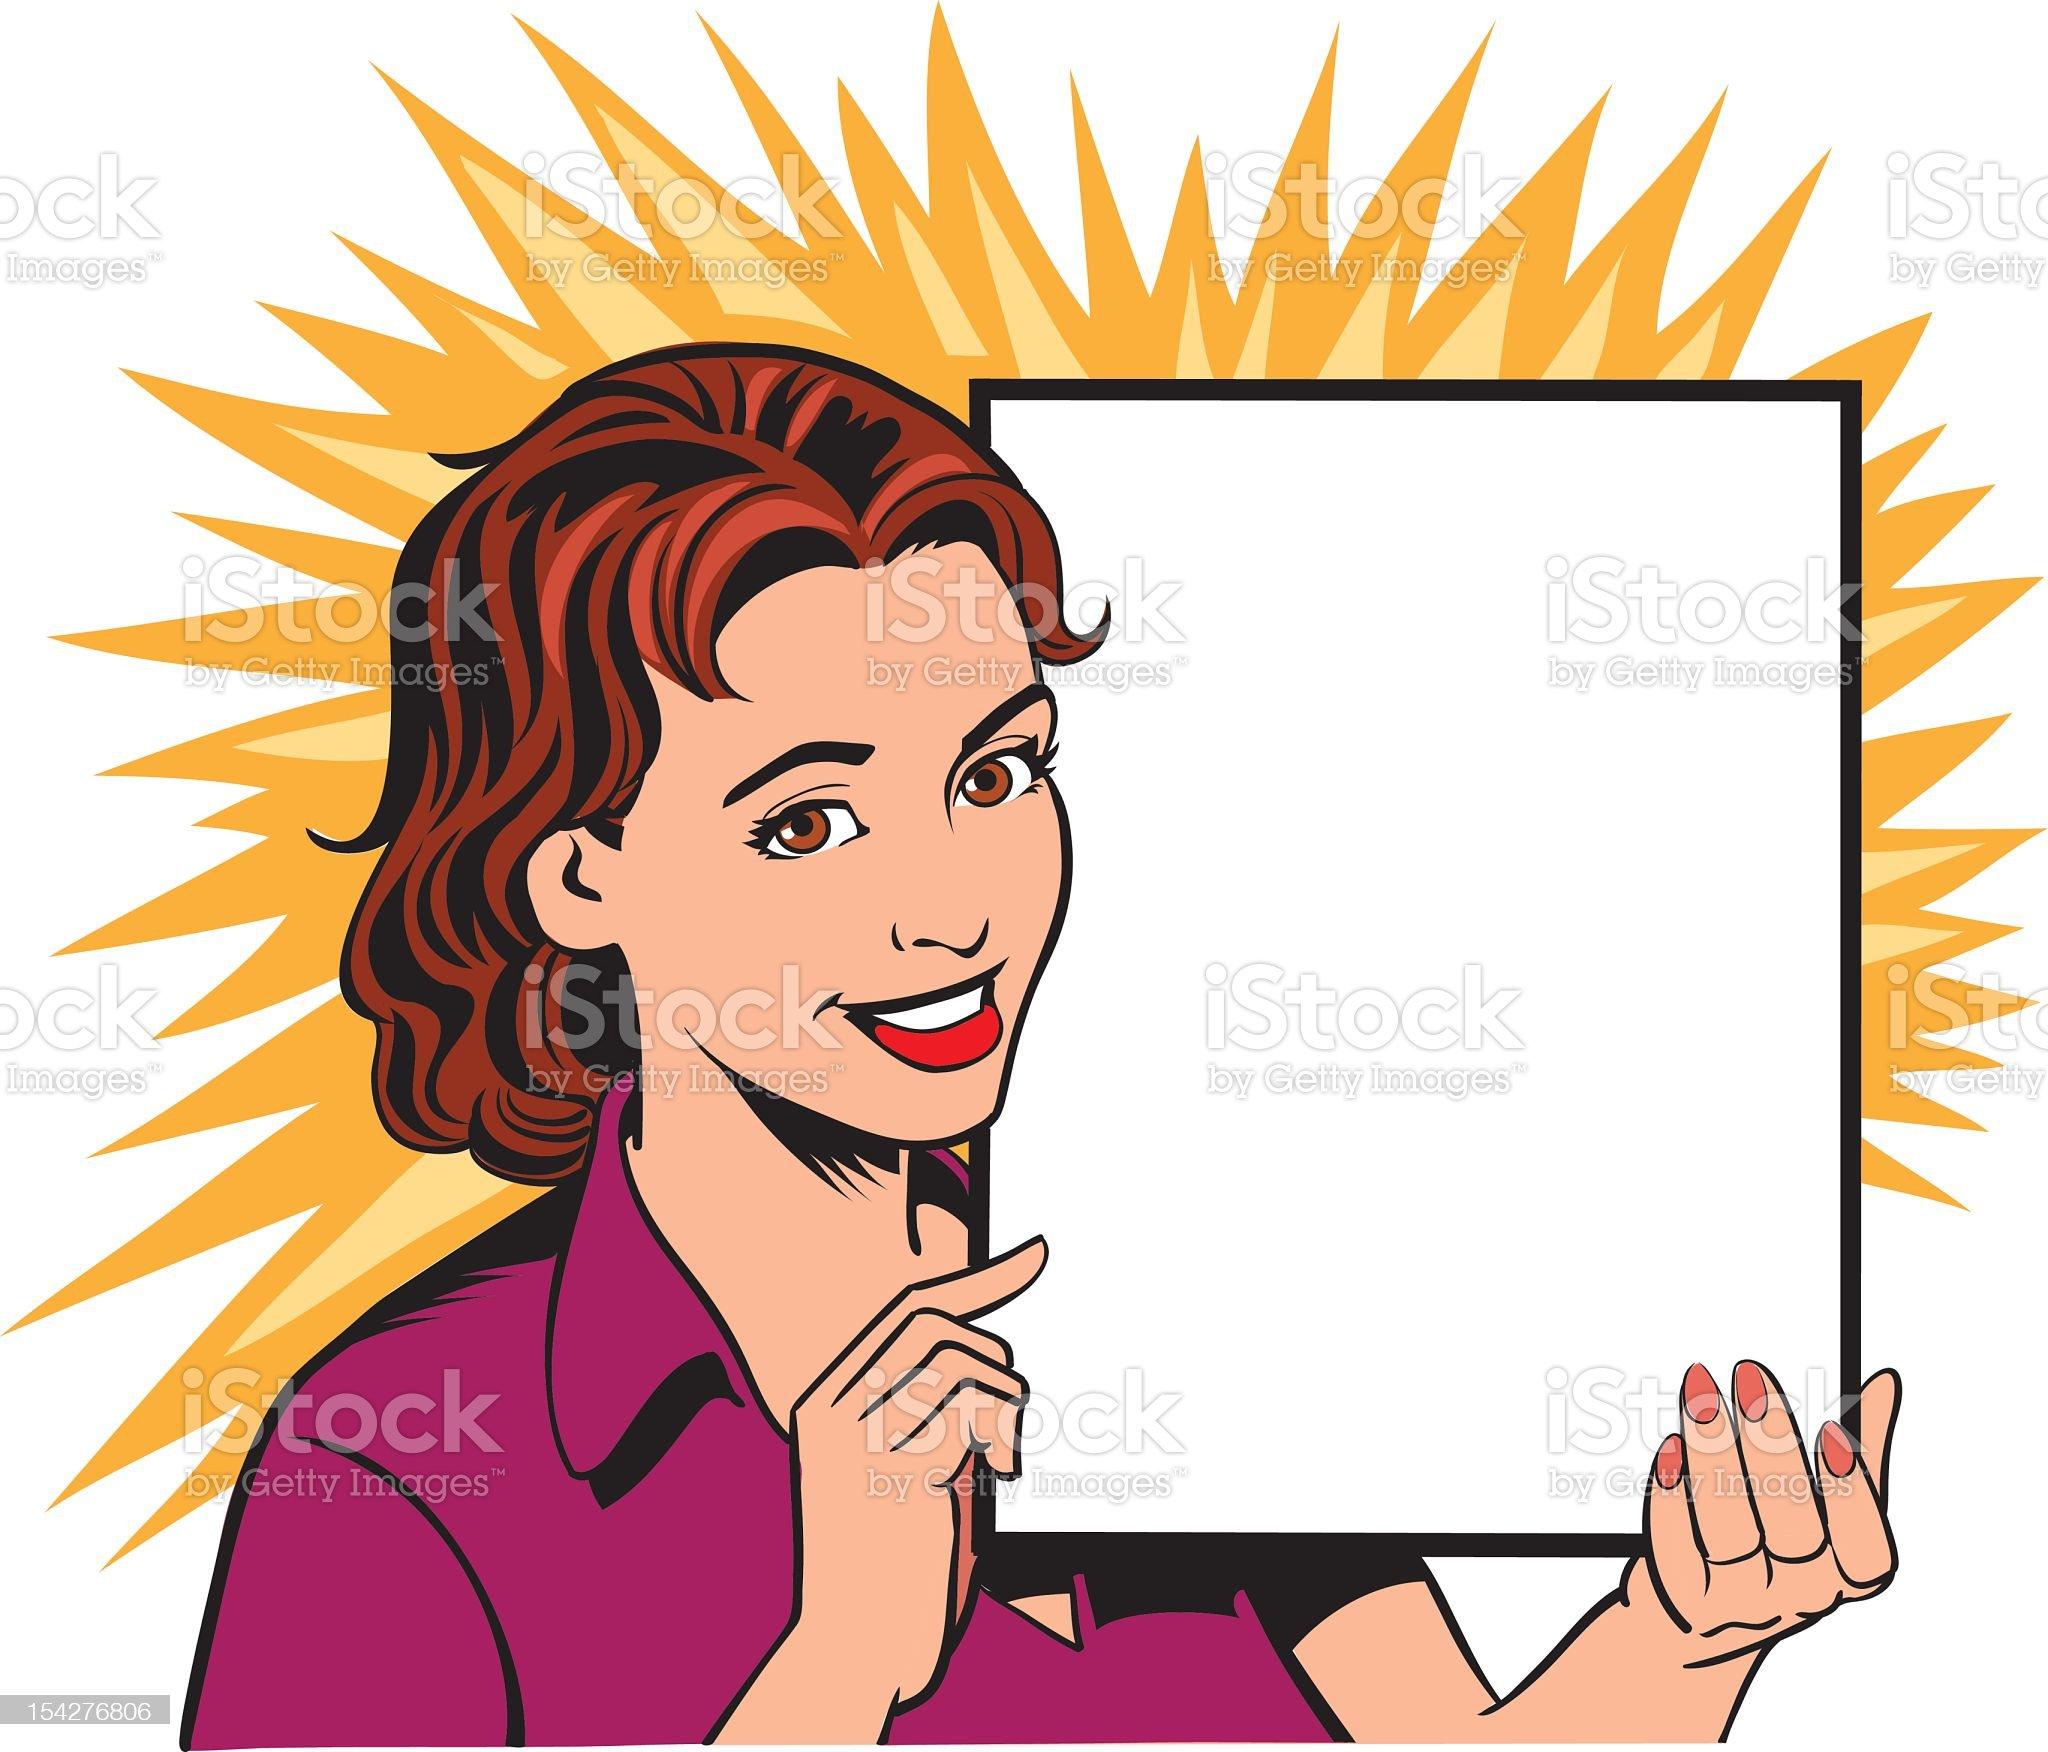 Retro cartoon woman holding a blank sign royalty-free stock vector art